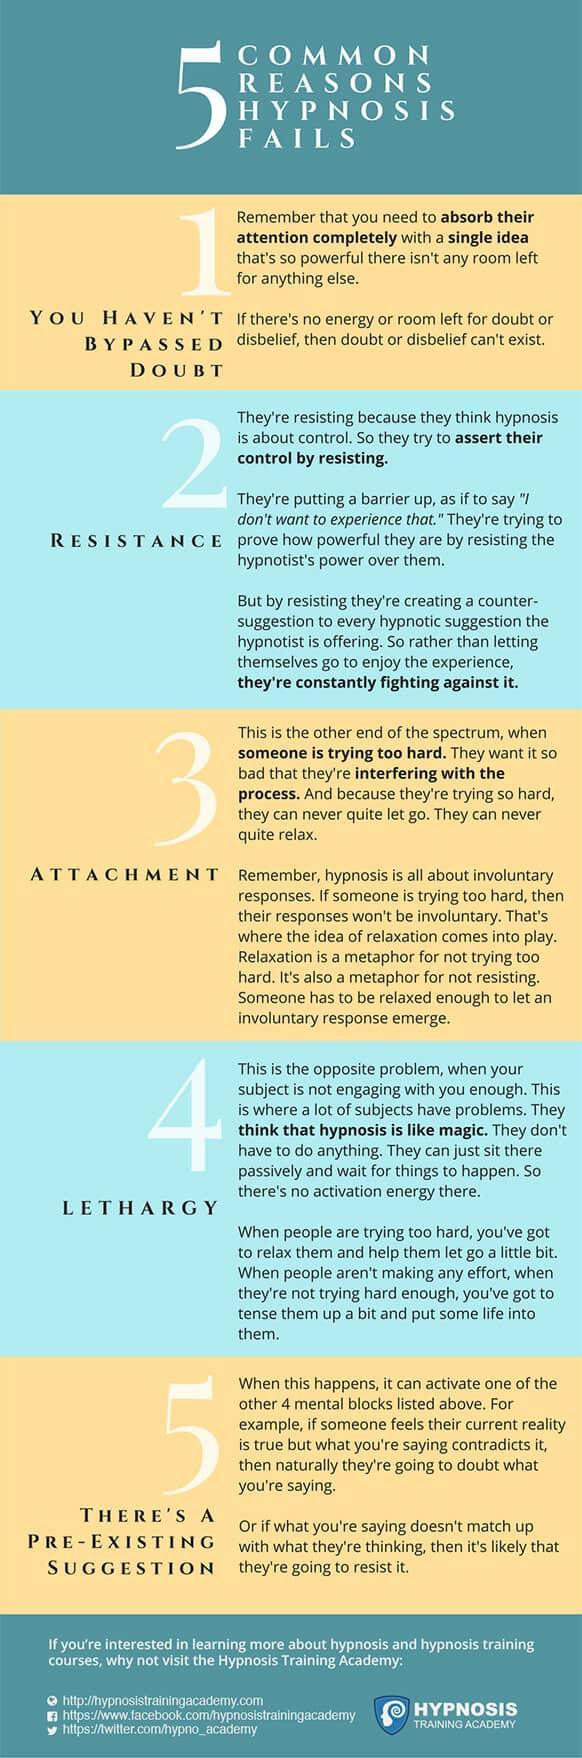 5 common reasons hypnosis fails